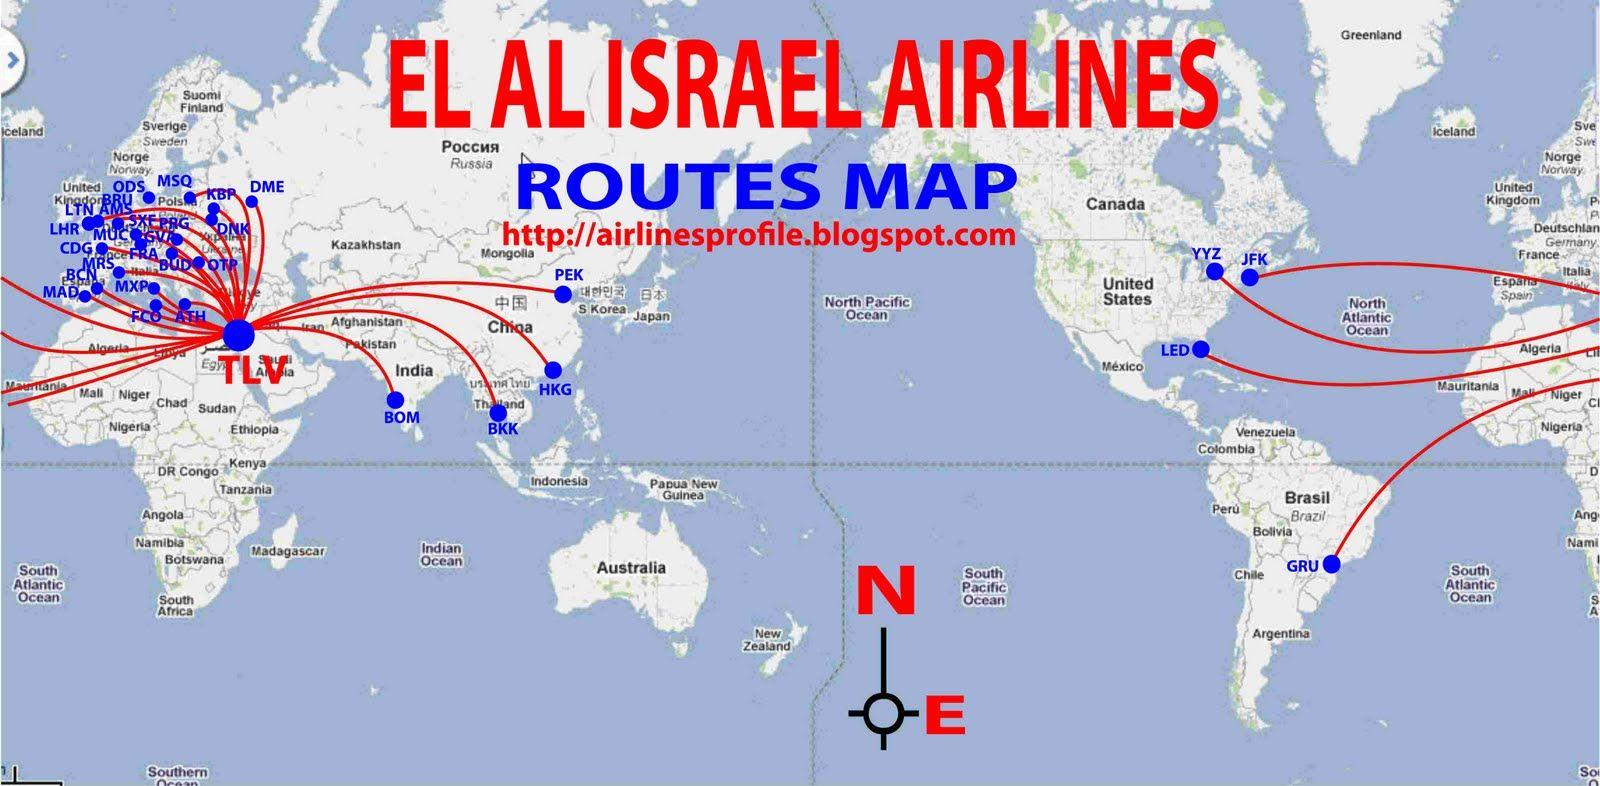 el al airlines 5 | El Al Israel Airlines routes map | Airline ...